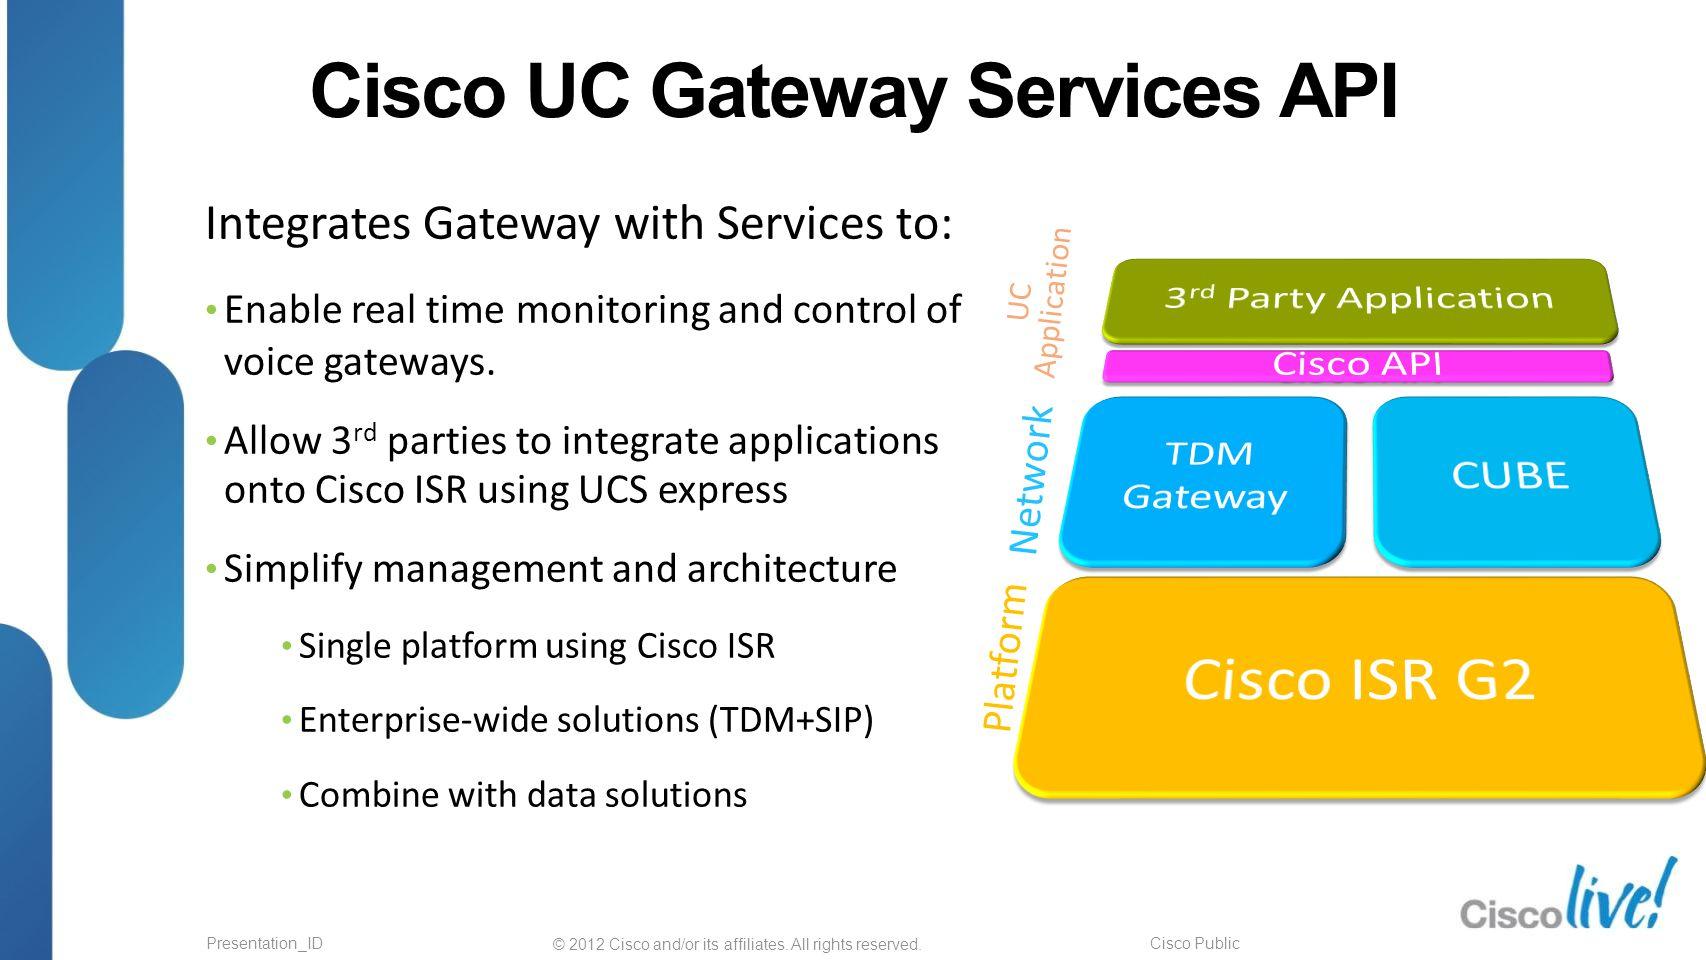 Cisco UC Gateway Services API: Drive revenue and